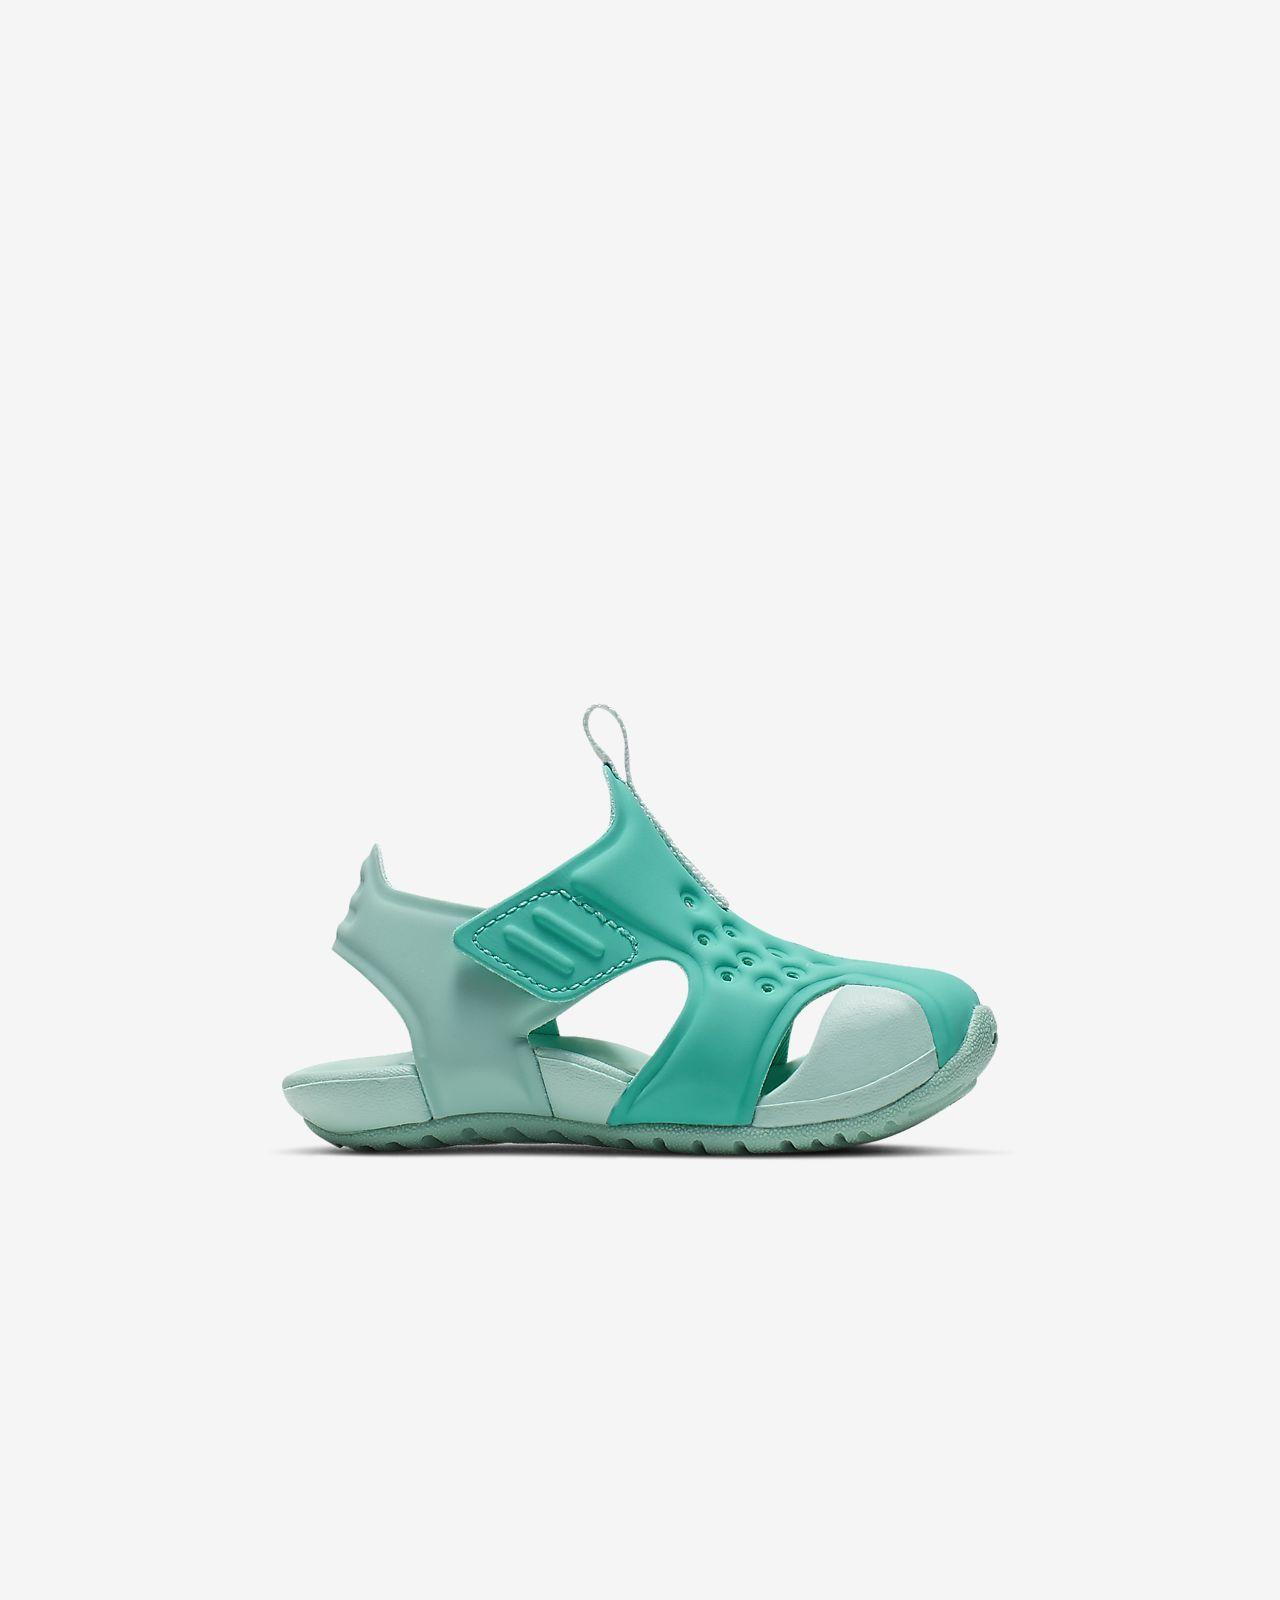 862b5c1a Сандалии для малышей Nike Sunray Protect 2. Nike.com RU